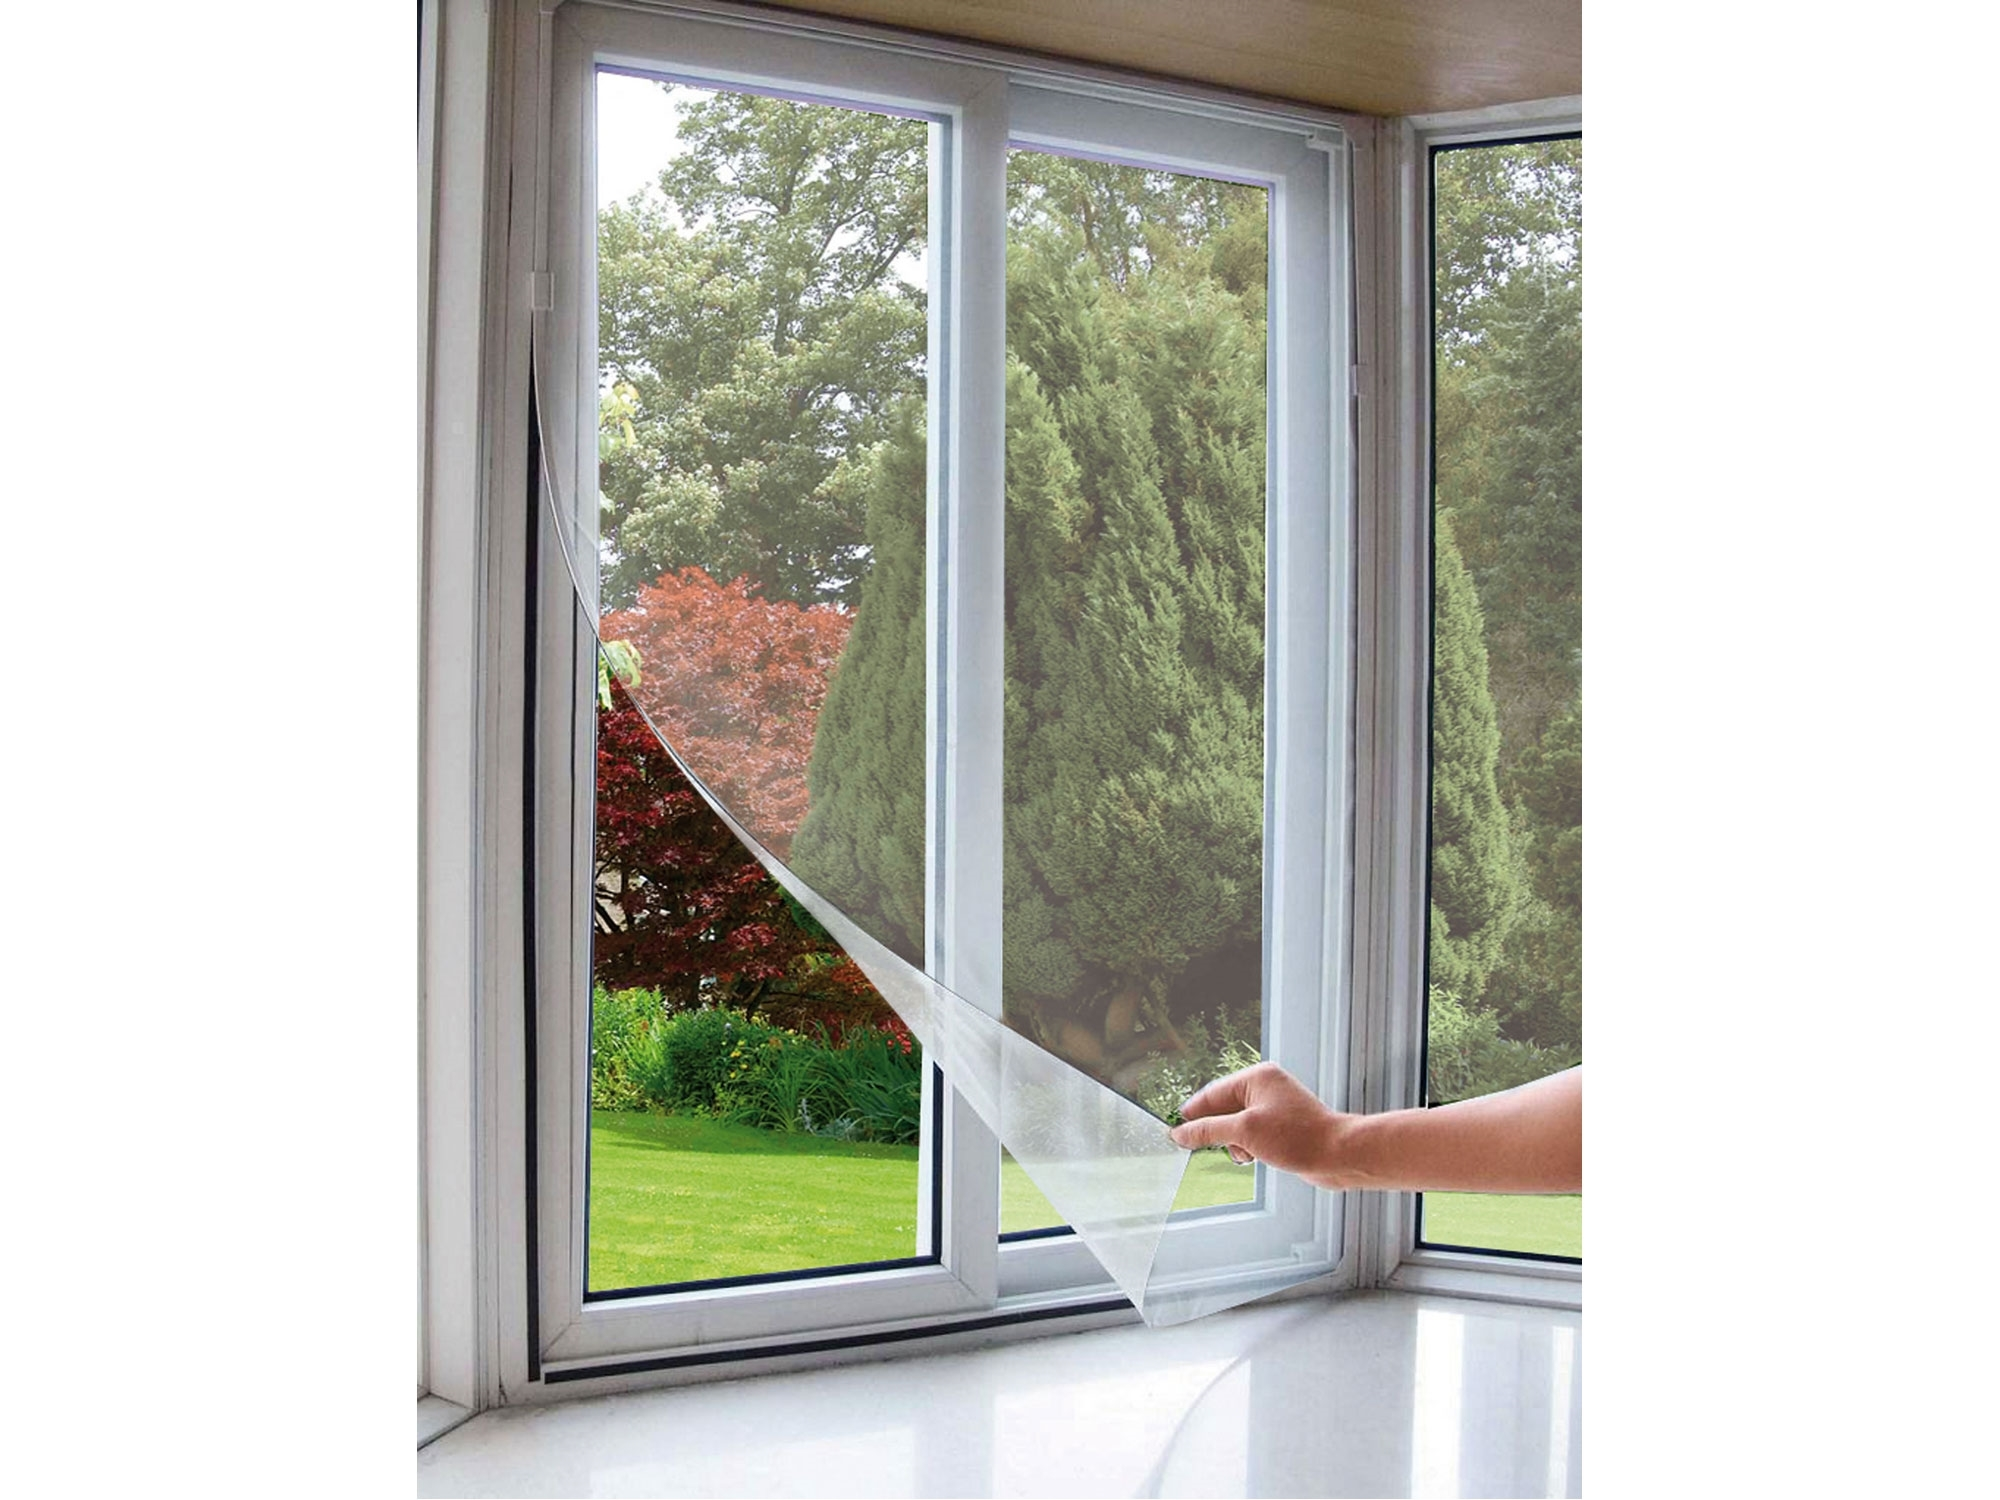 síť okenní proti hmyzu, 130x150cm, bílá, PES